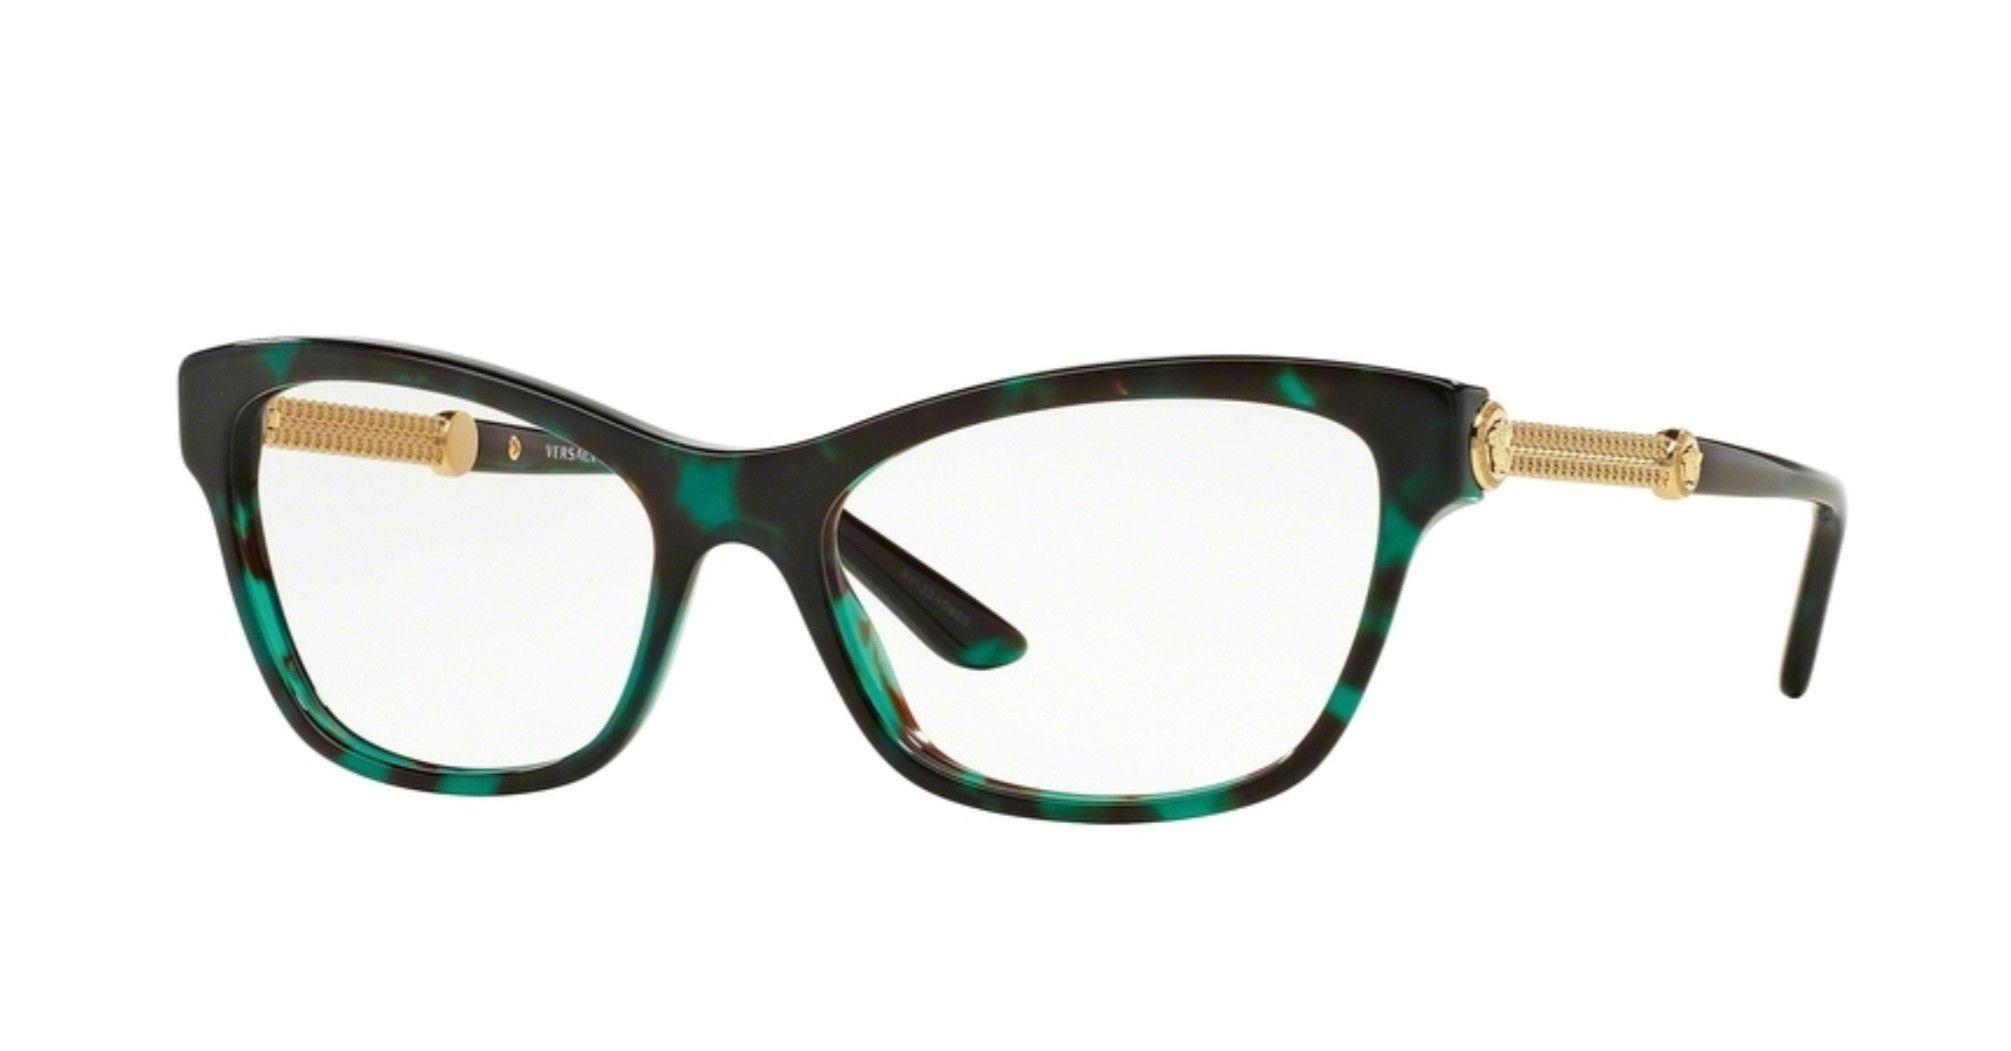 dec1cd5e3290b Versace VE3214-5076 Green Havana and Gold Eyeglasses - Sale! Up to 75% OFF!  Shop at Stylizio for women s and men s designer handbags